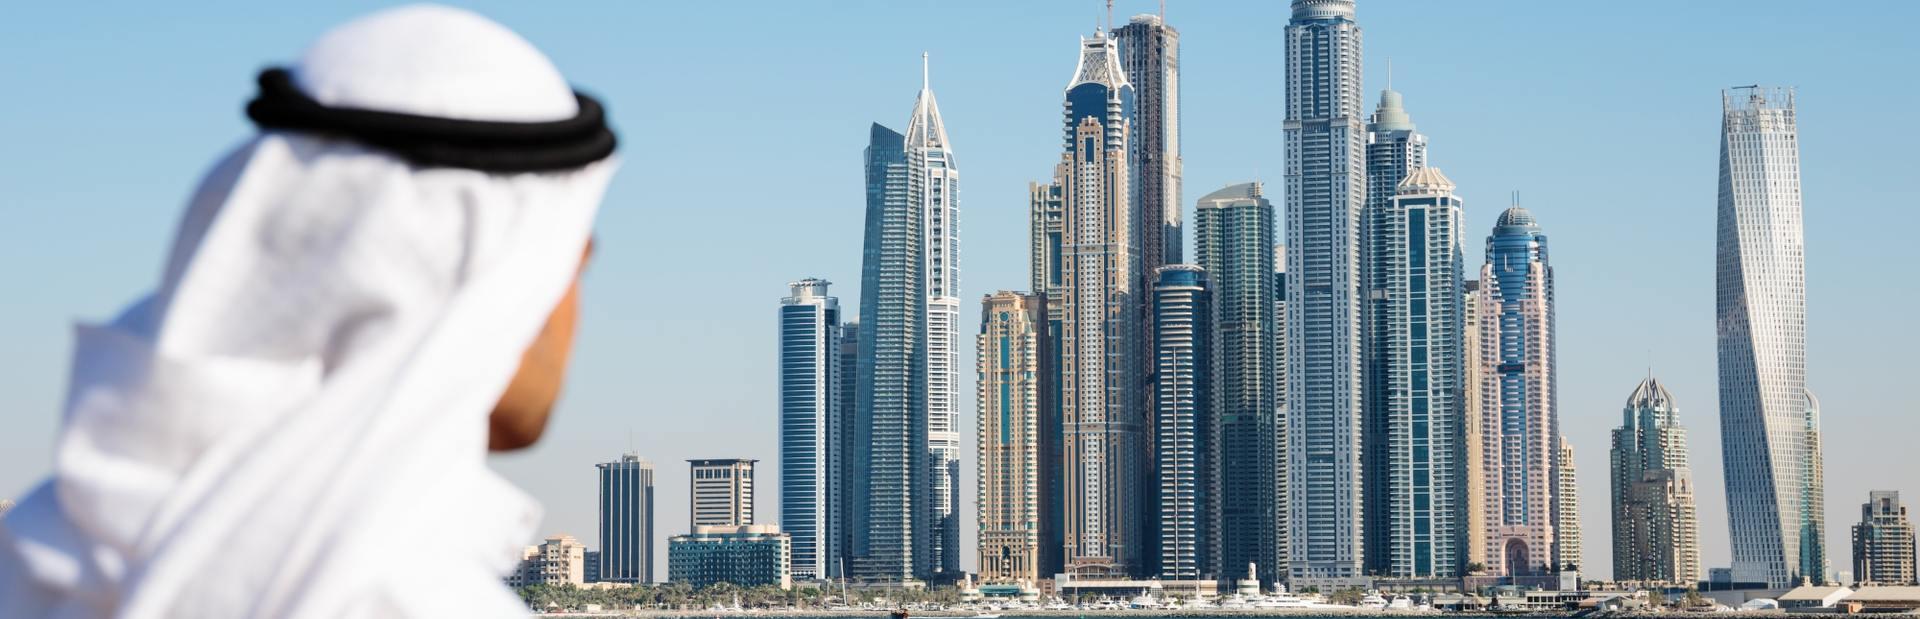 Arabian Gulf climate photo